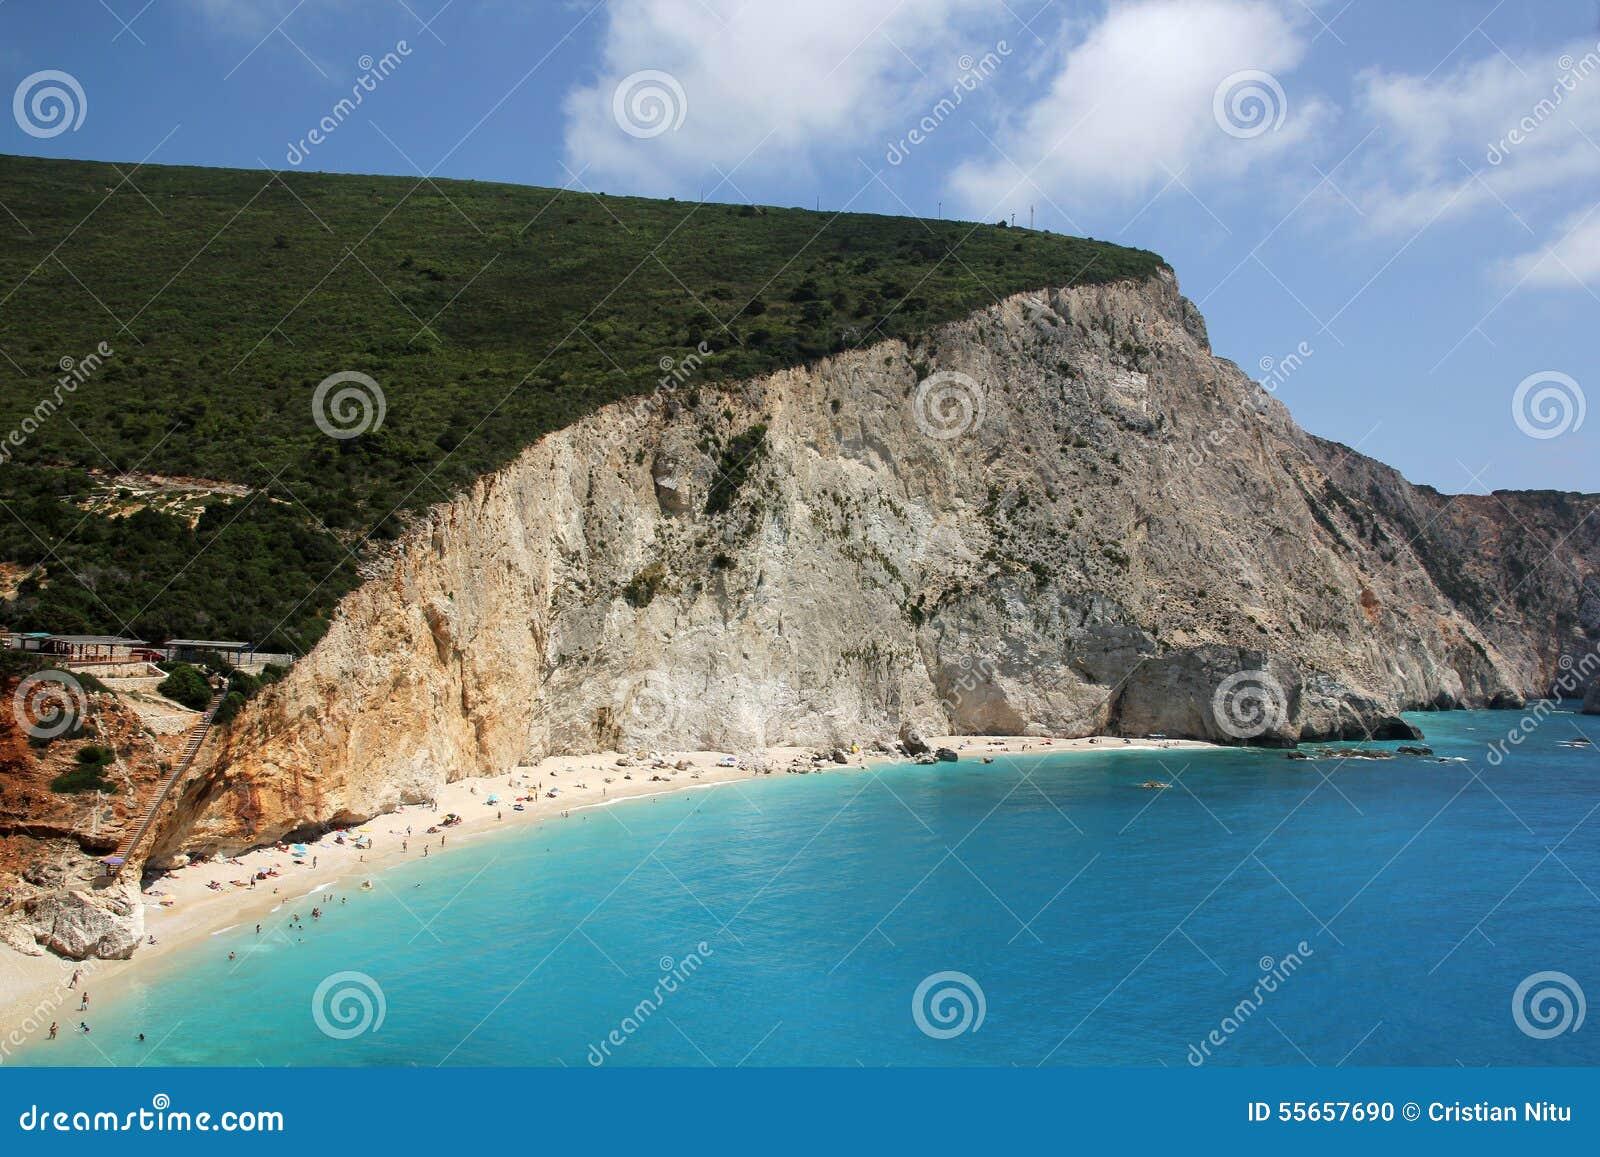 Aerial View of Porto Katsiki Beach, Lefkada Island